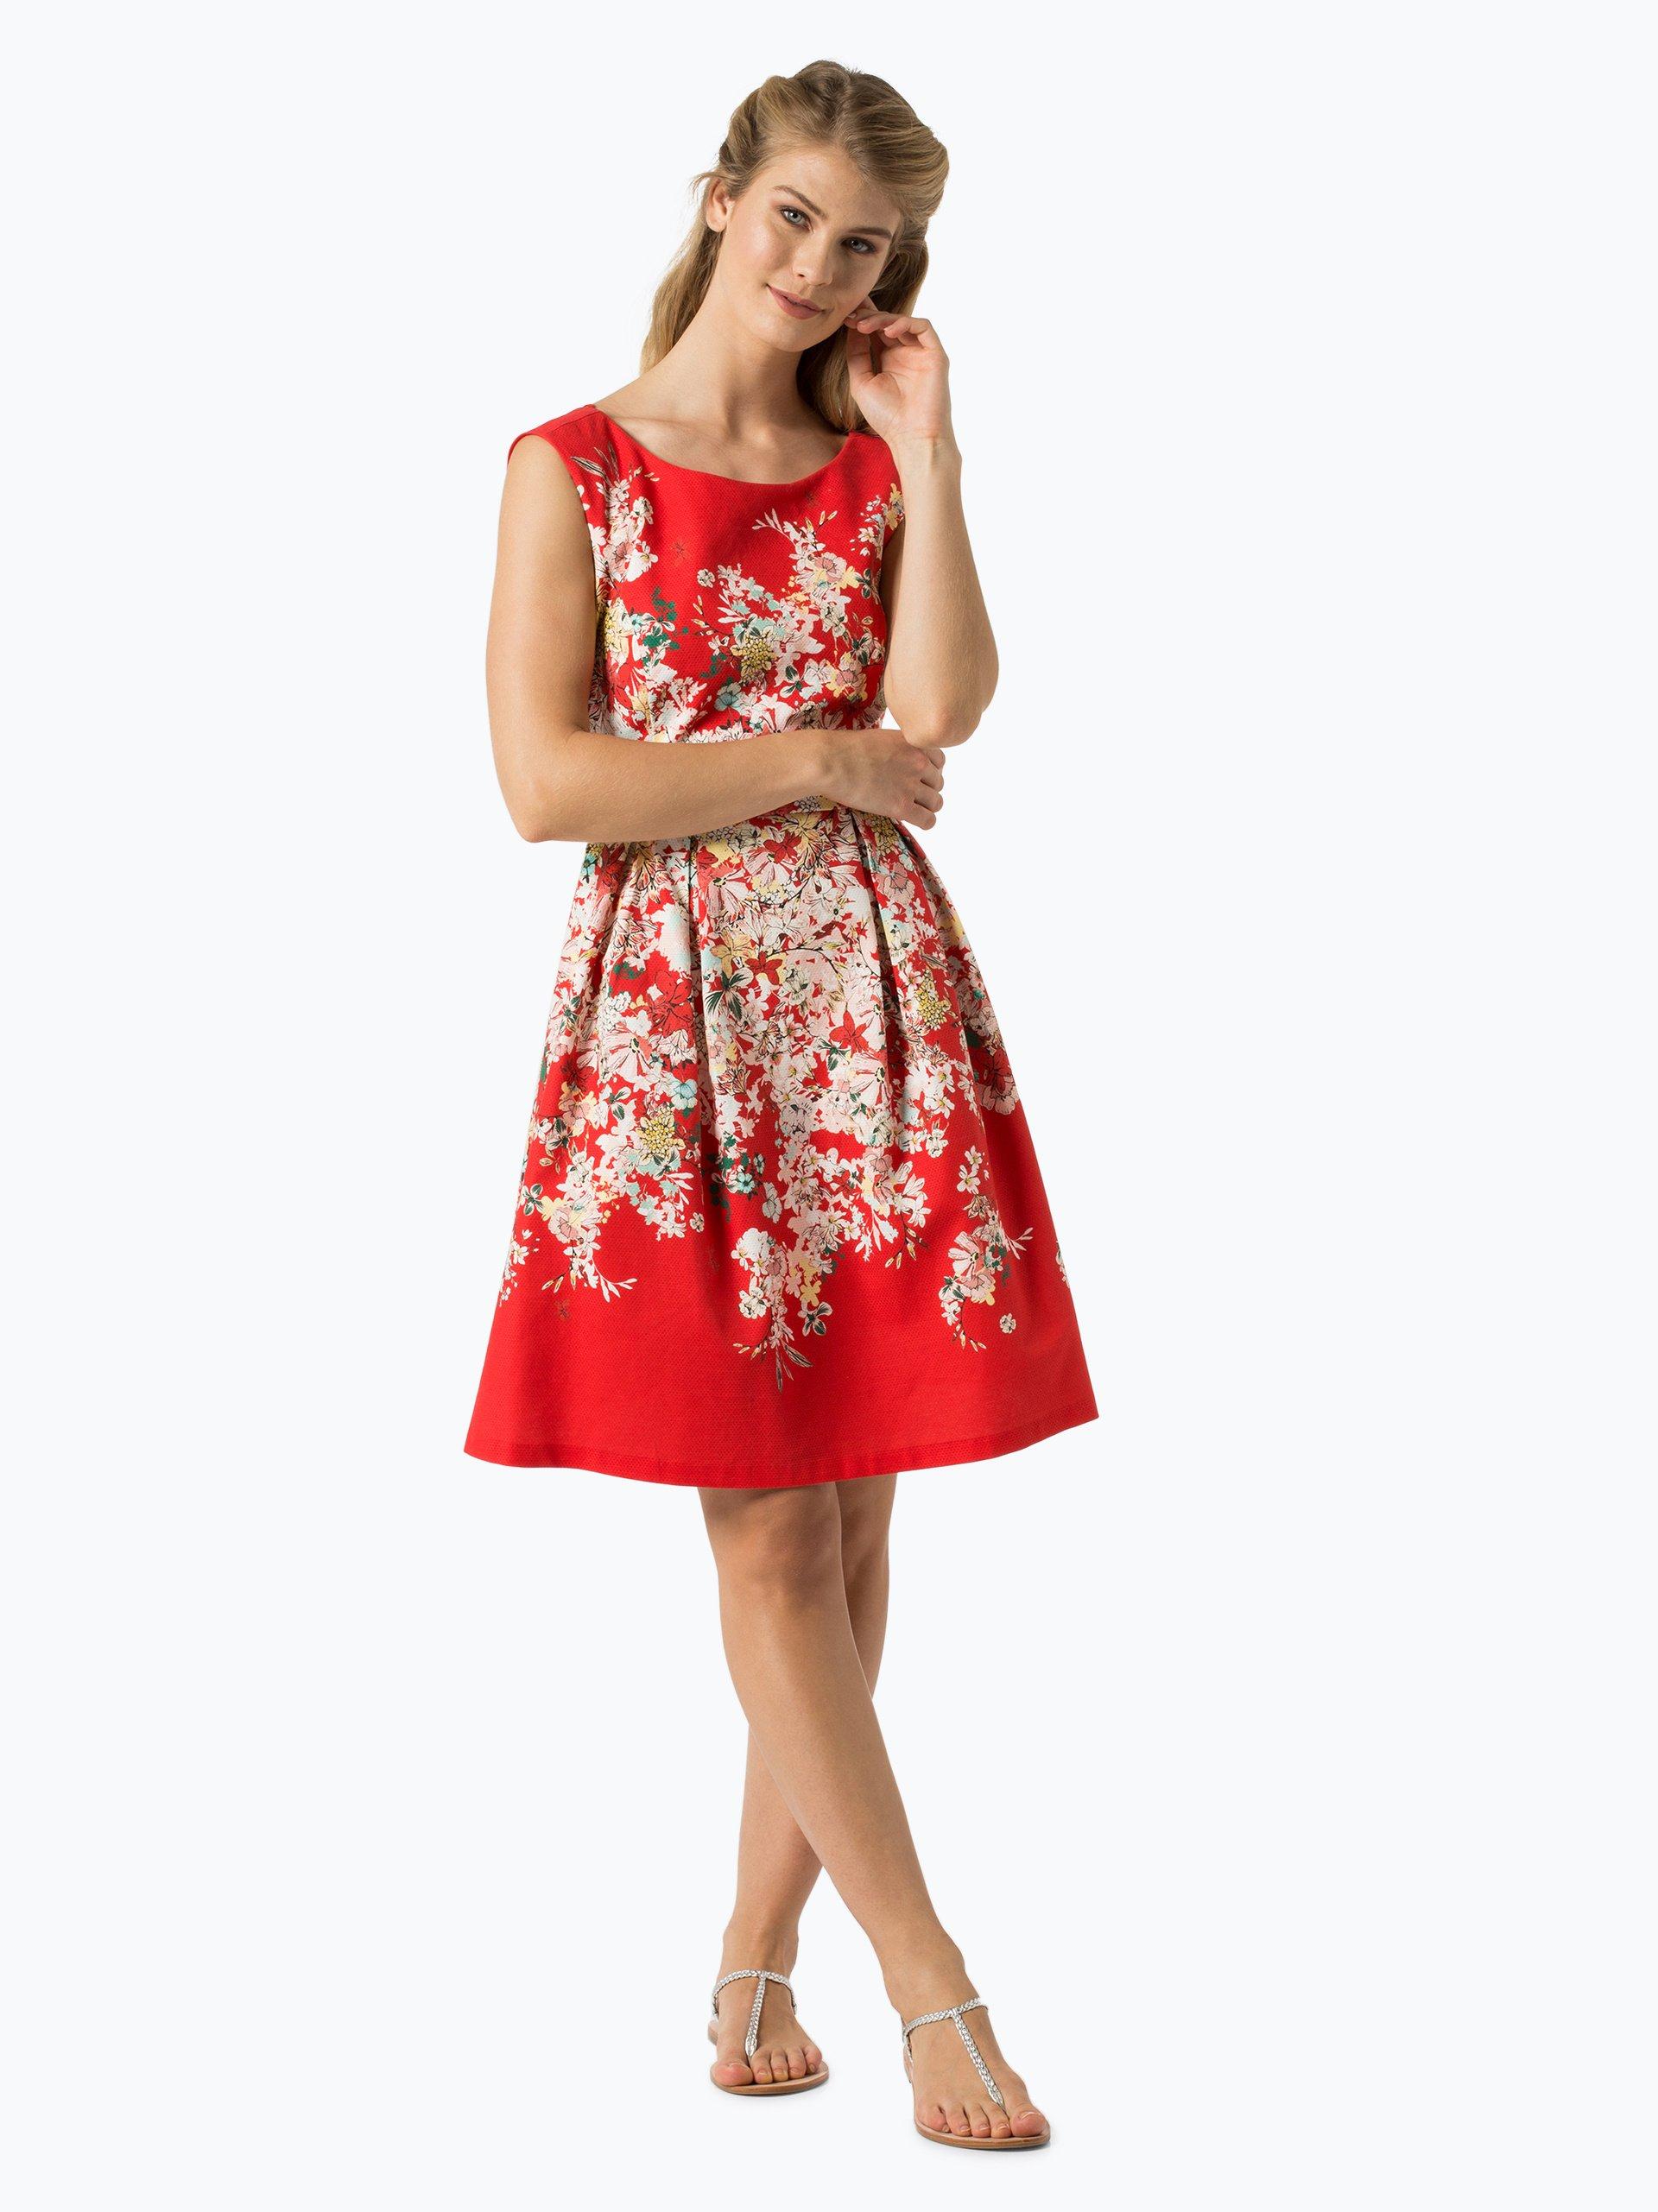 comma damen kleid rot bedruckt online kaufen peek und cloppenburg de. Black Bedroom Furniture Sets. Home Design Ideas